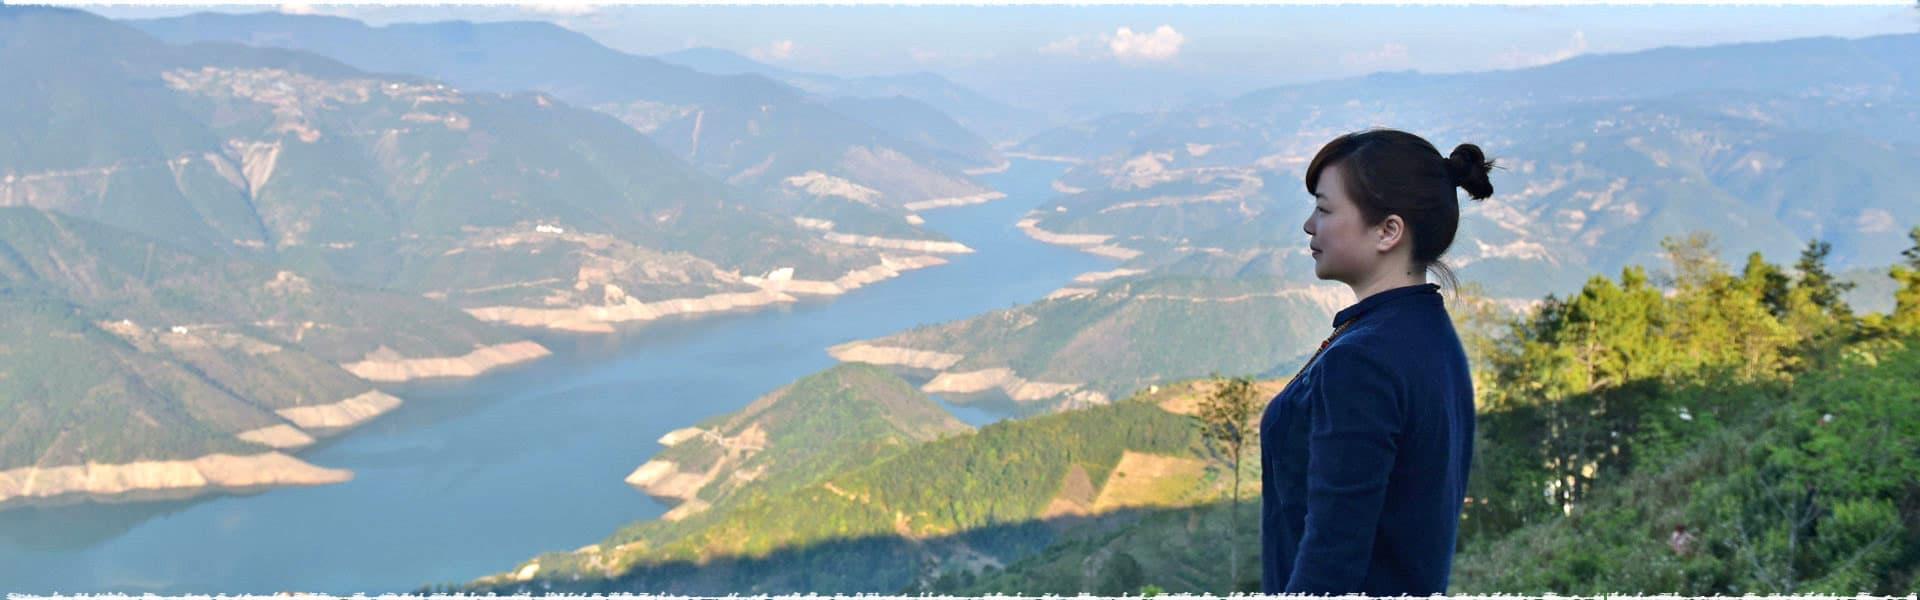 Dreamland – Yunnan, Fengqing (Part 1)